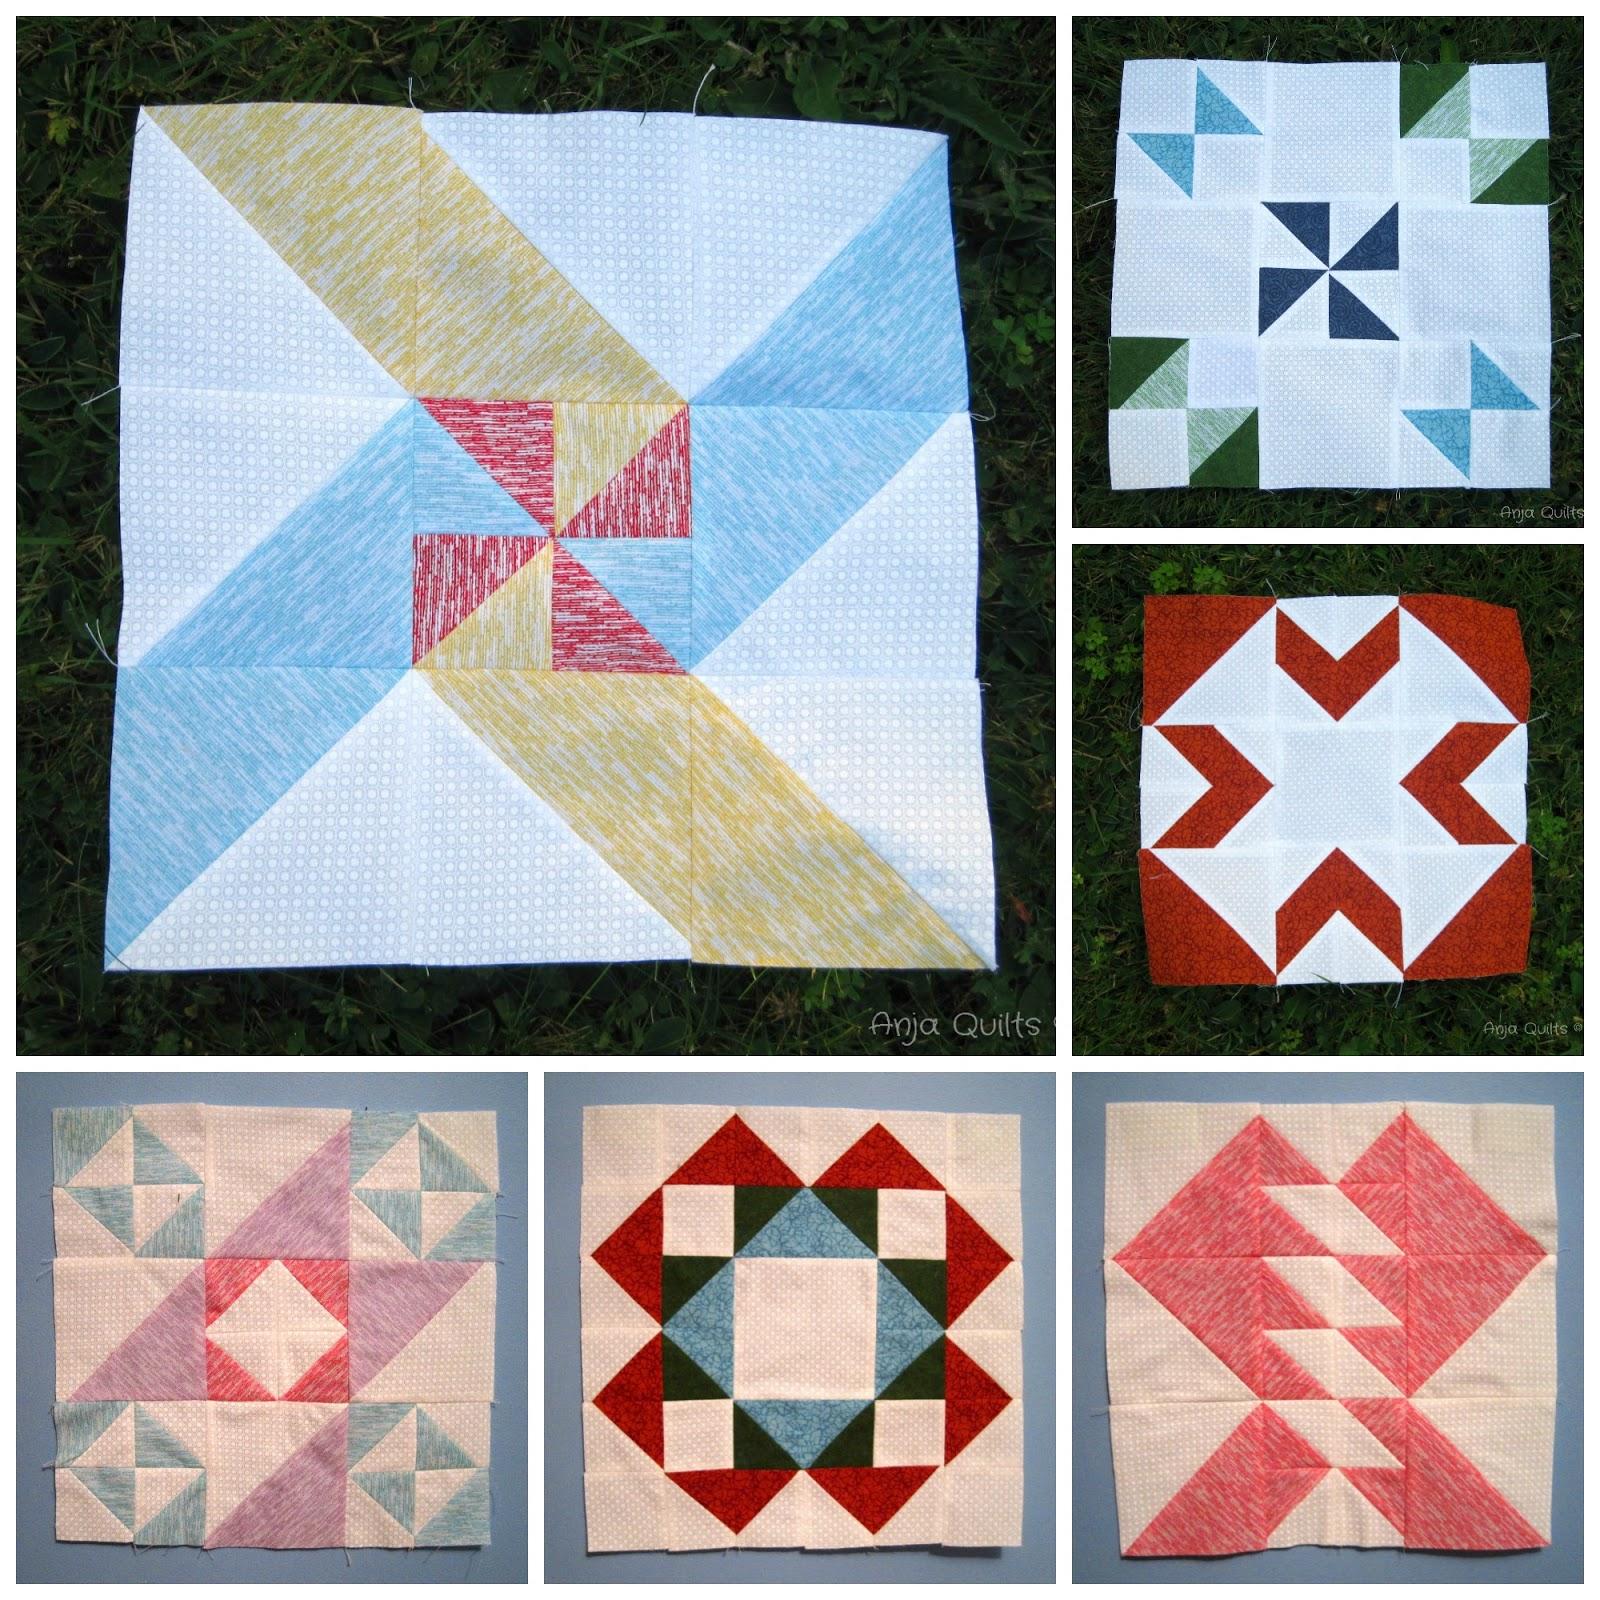 Anja quilts modern hst sampler q3 blocks for Modern house quilts